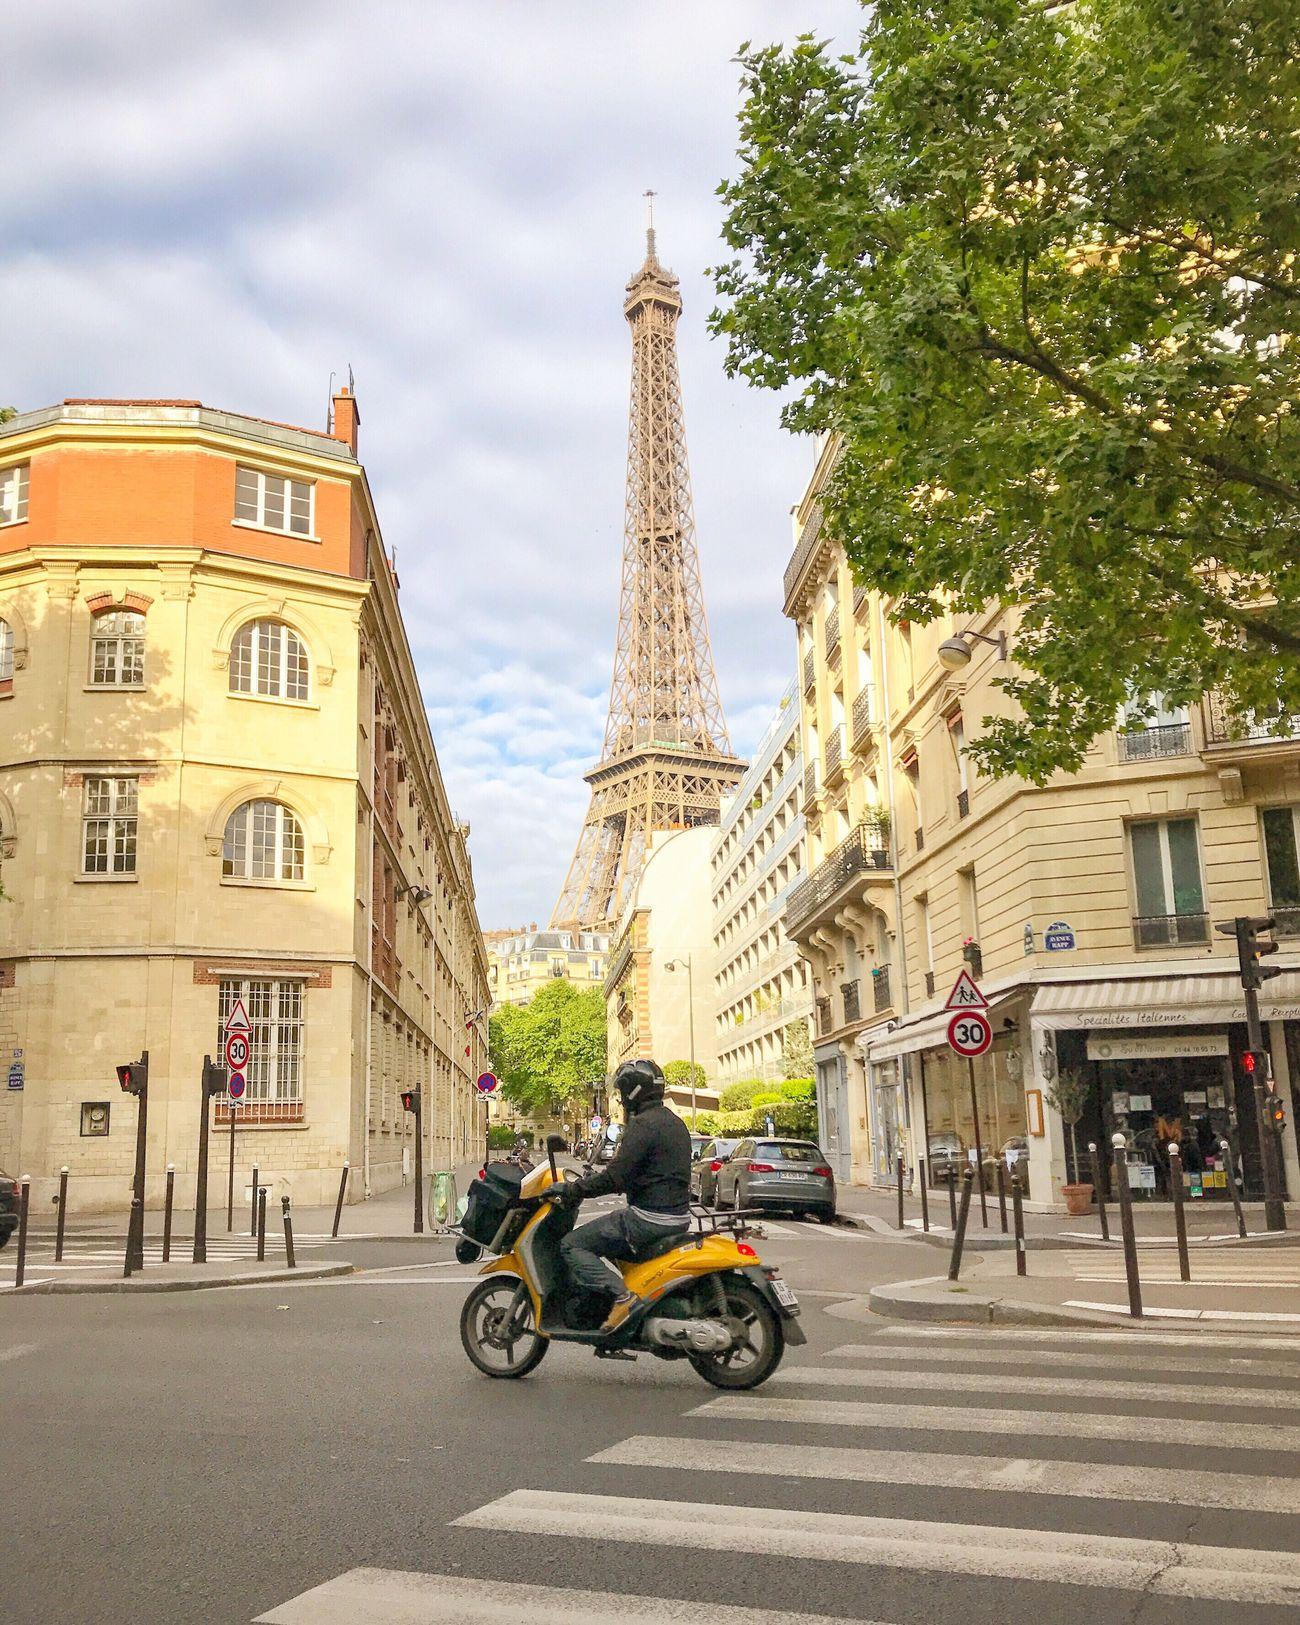 Bonjour Paris! Have a great weekend! City Street City Tour Eiffel Eiffel Tower EyeEm Best Shots Parisweloveyou Paris Photooftheday Eyem Best Shot - Architecture Paris ❤